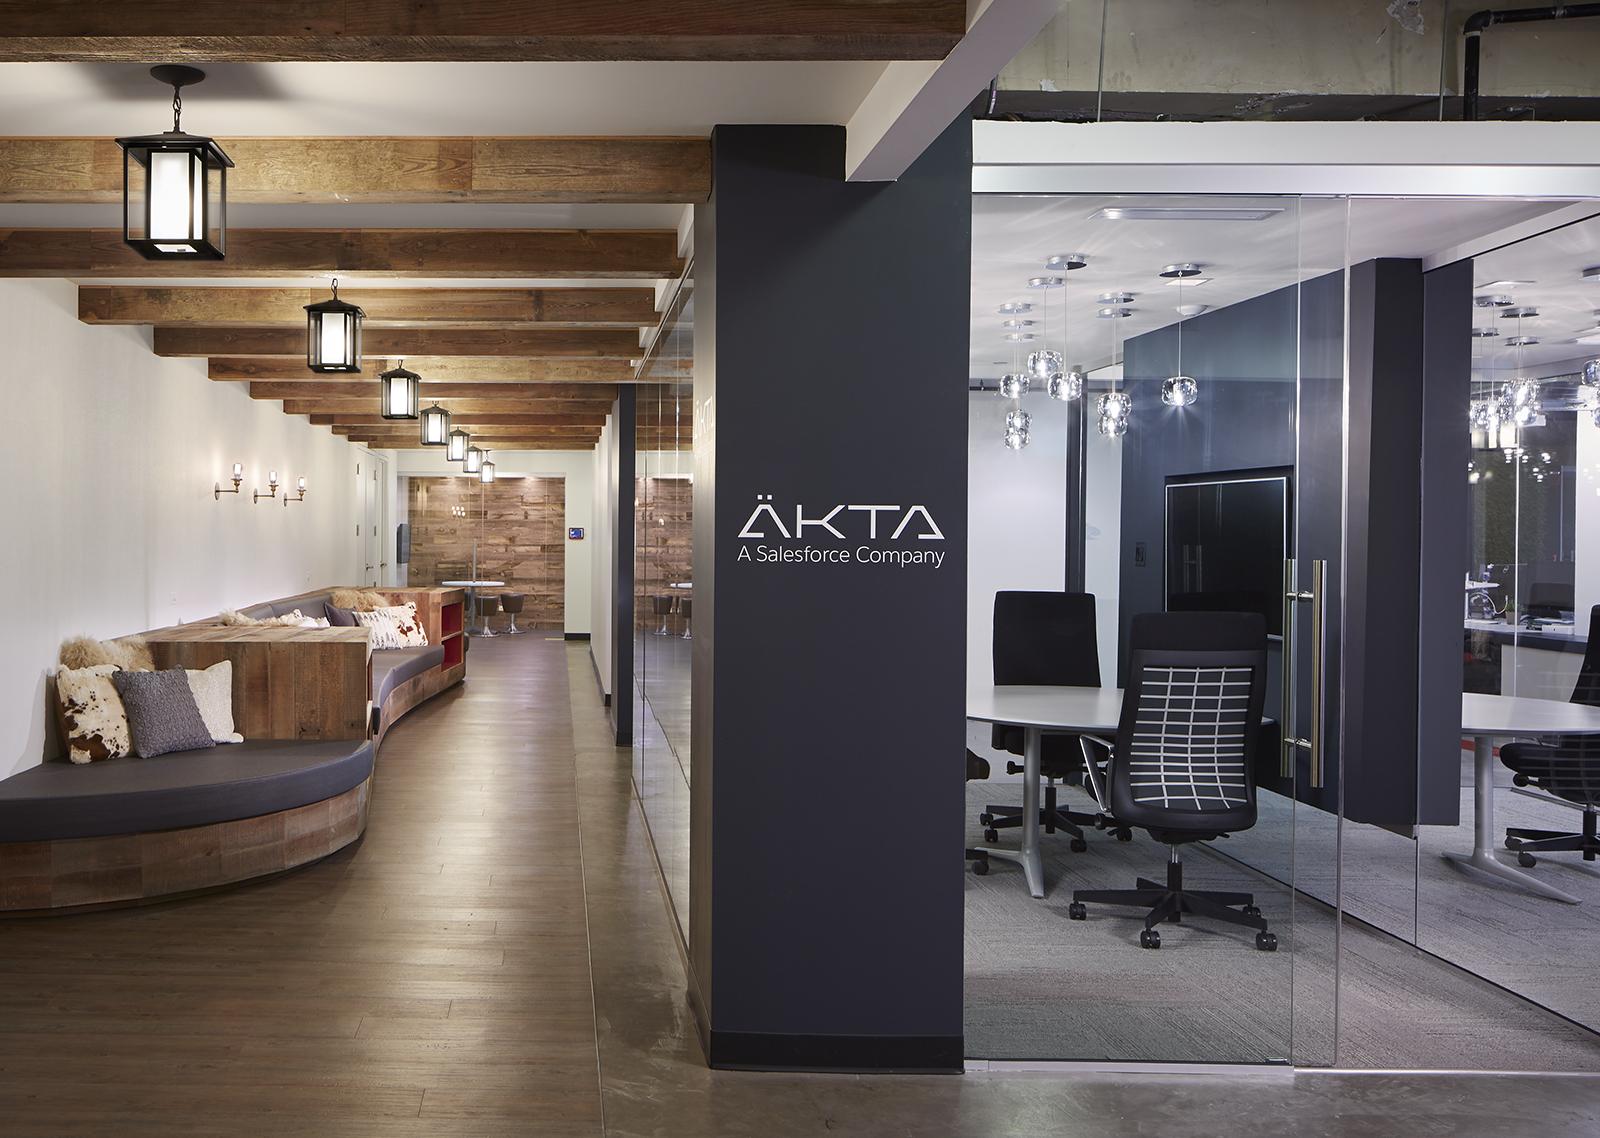 akta-chicago-office-3